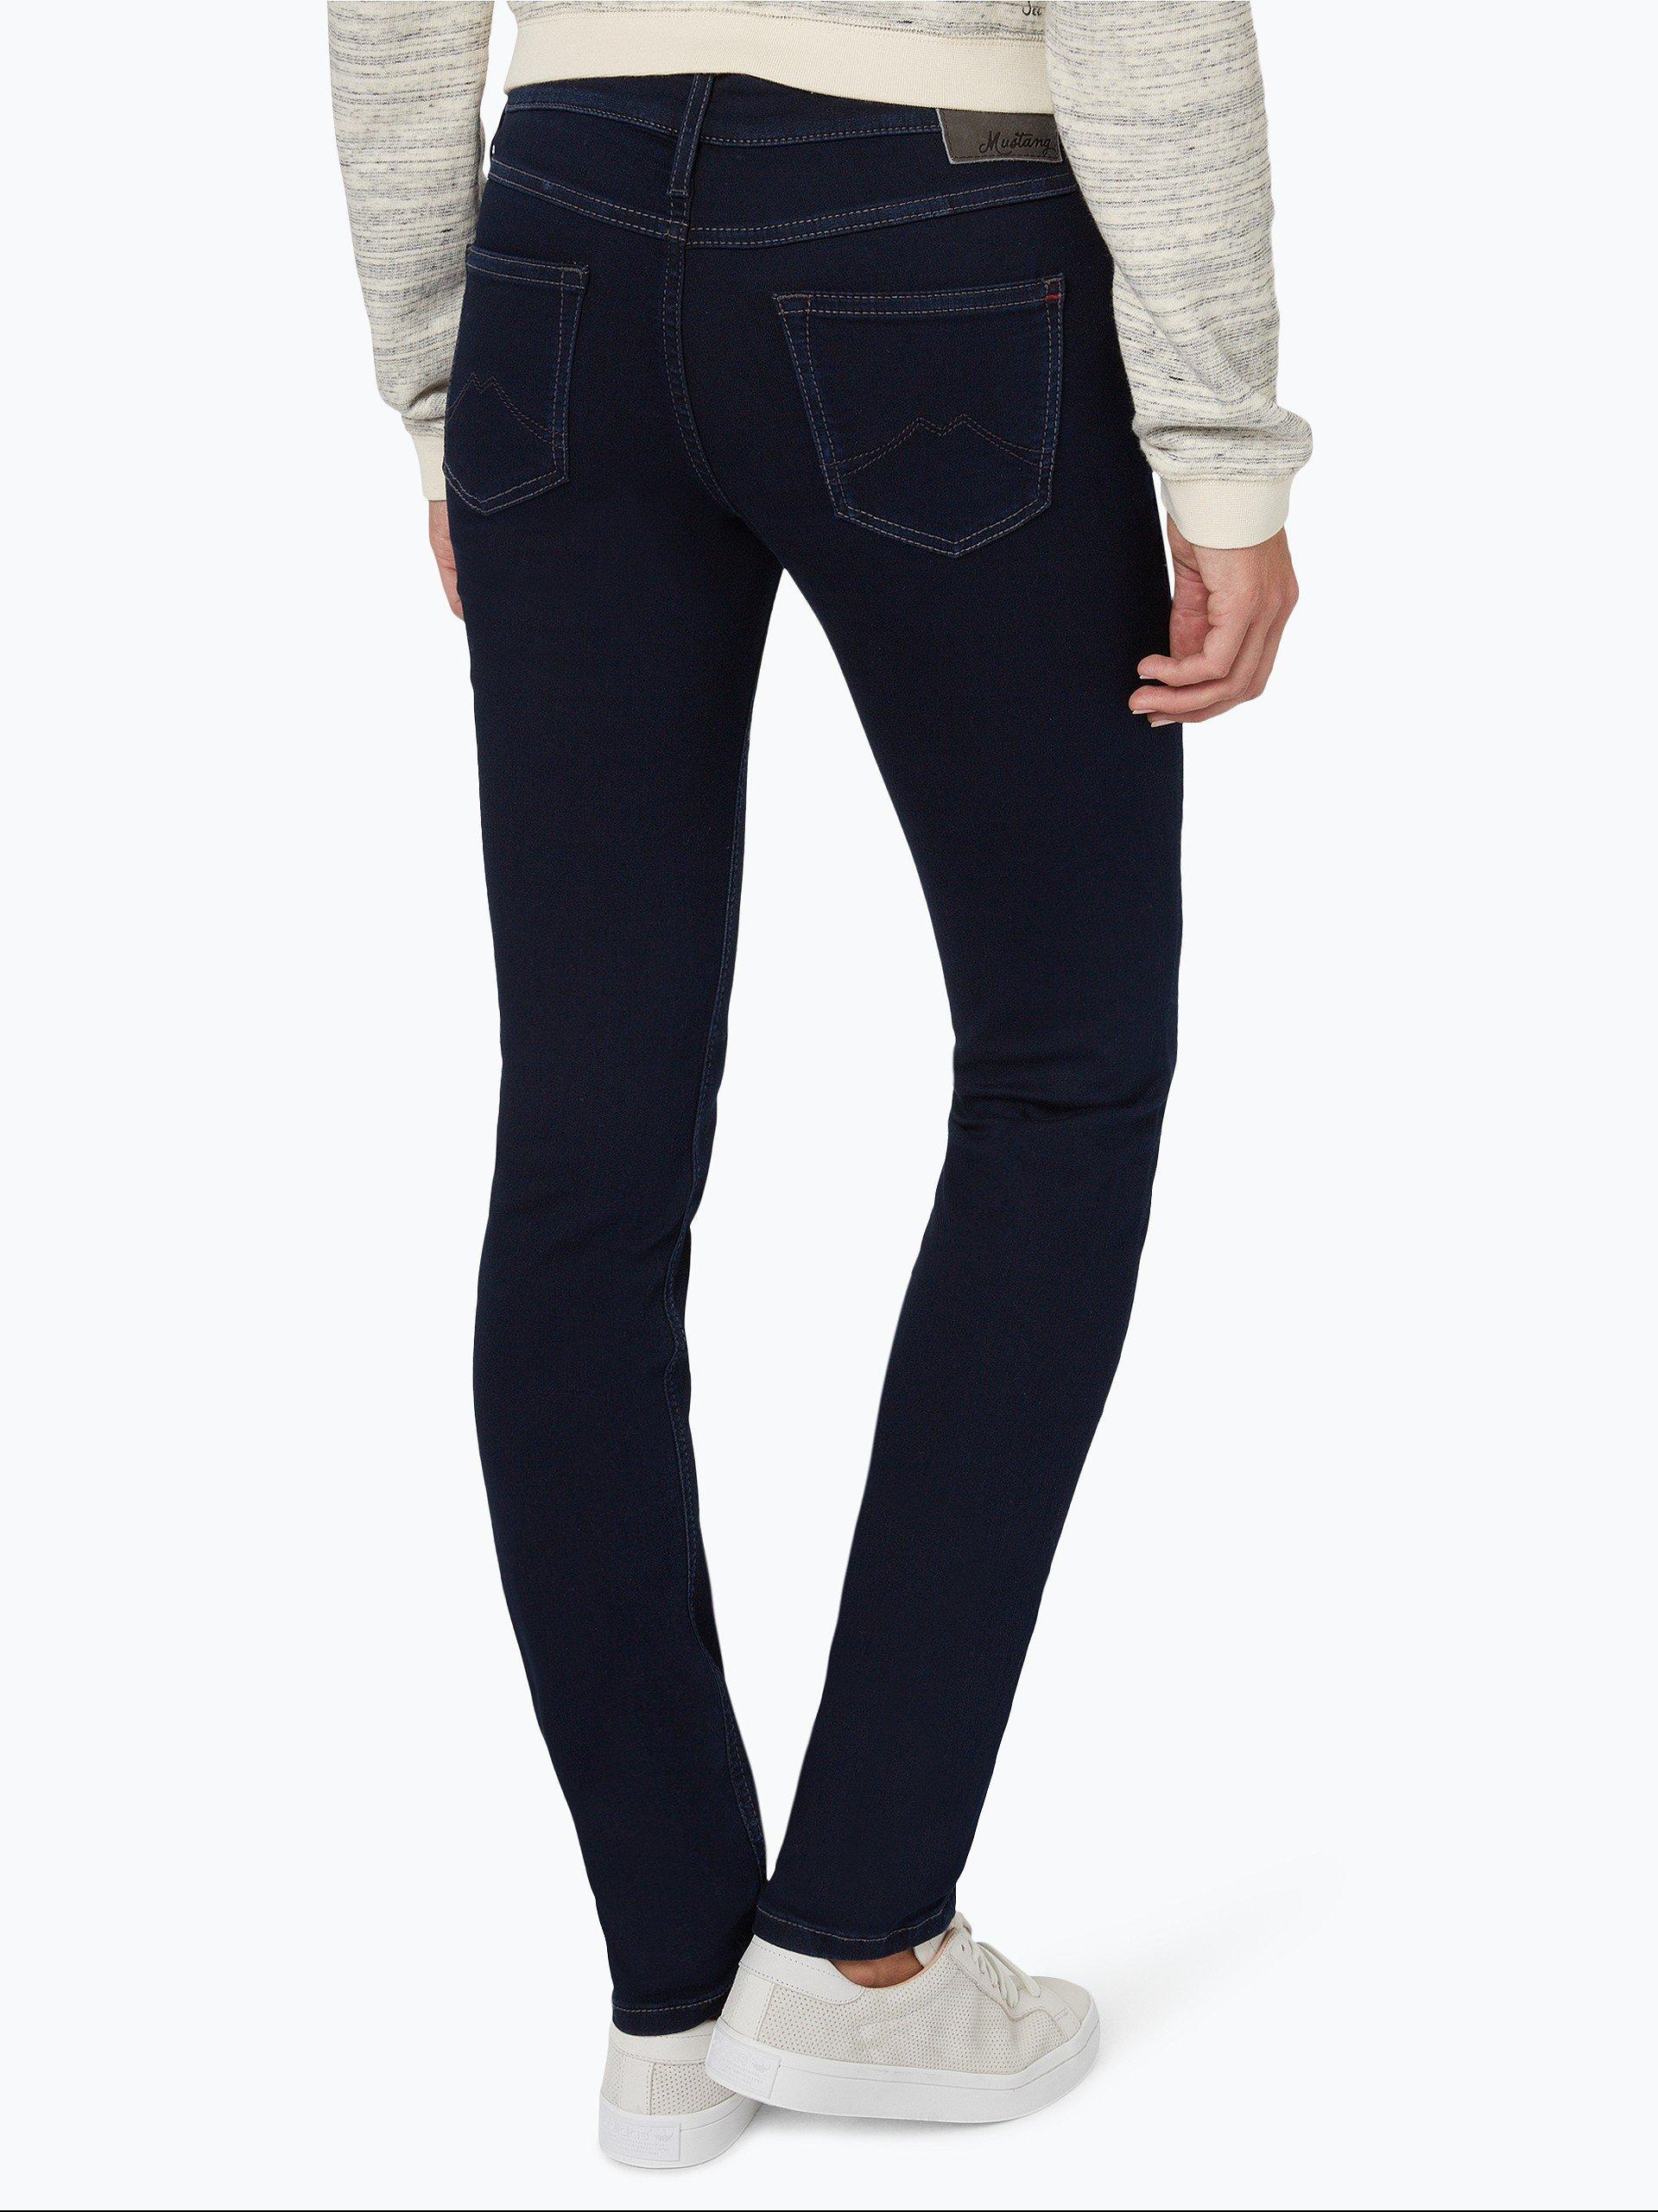 mustang damen jeans jasmin light stone uni online kaufen. Black Bedroom Furniture Sets. Home Design Ideas